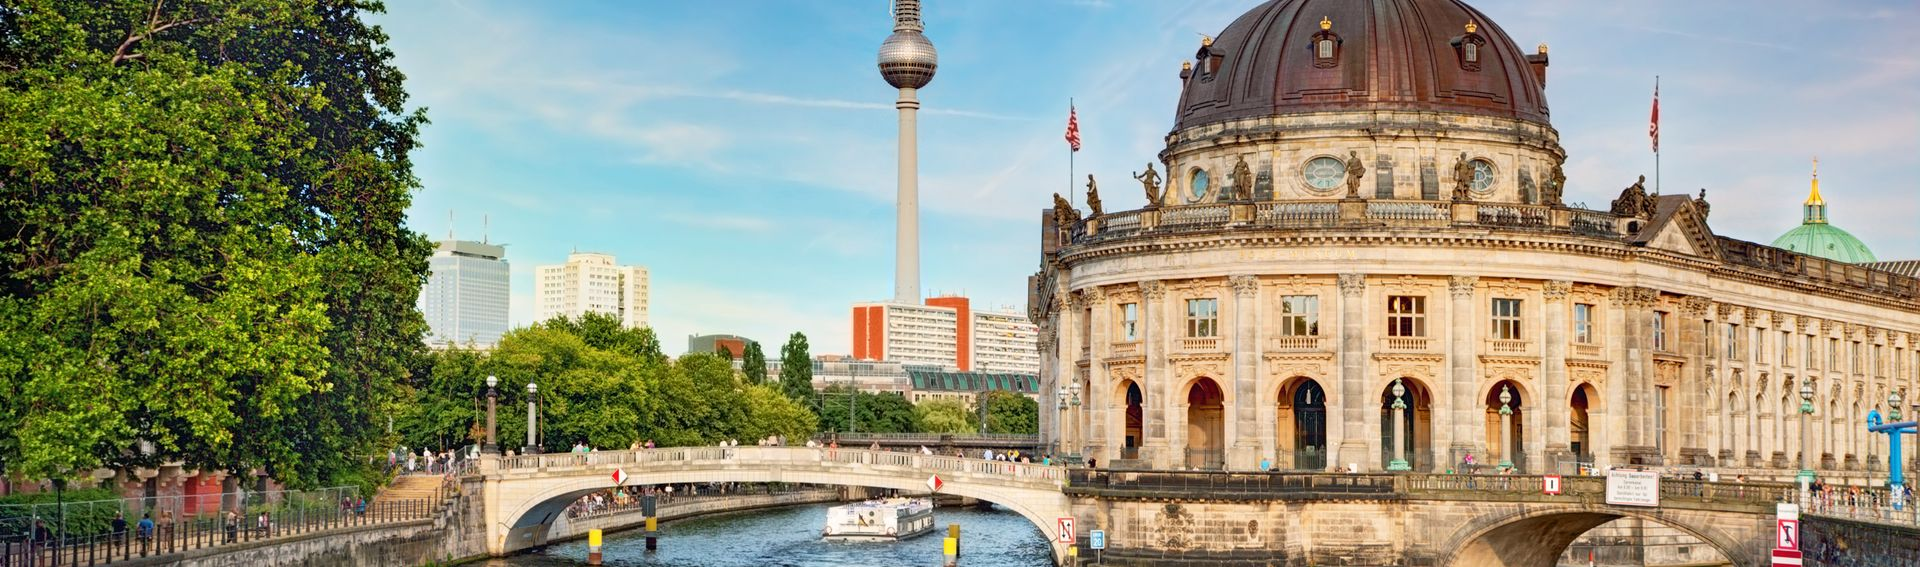 Berlin Mitte / Alexanderplatz